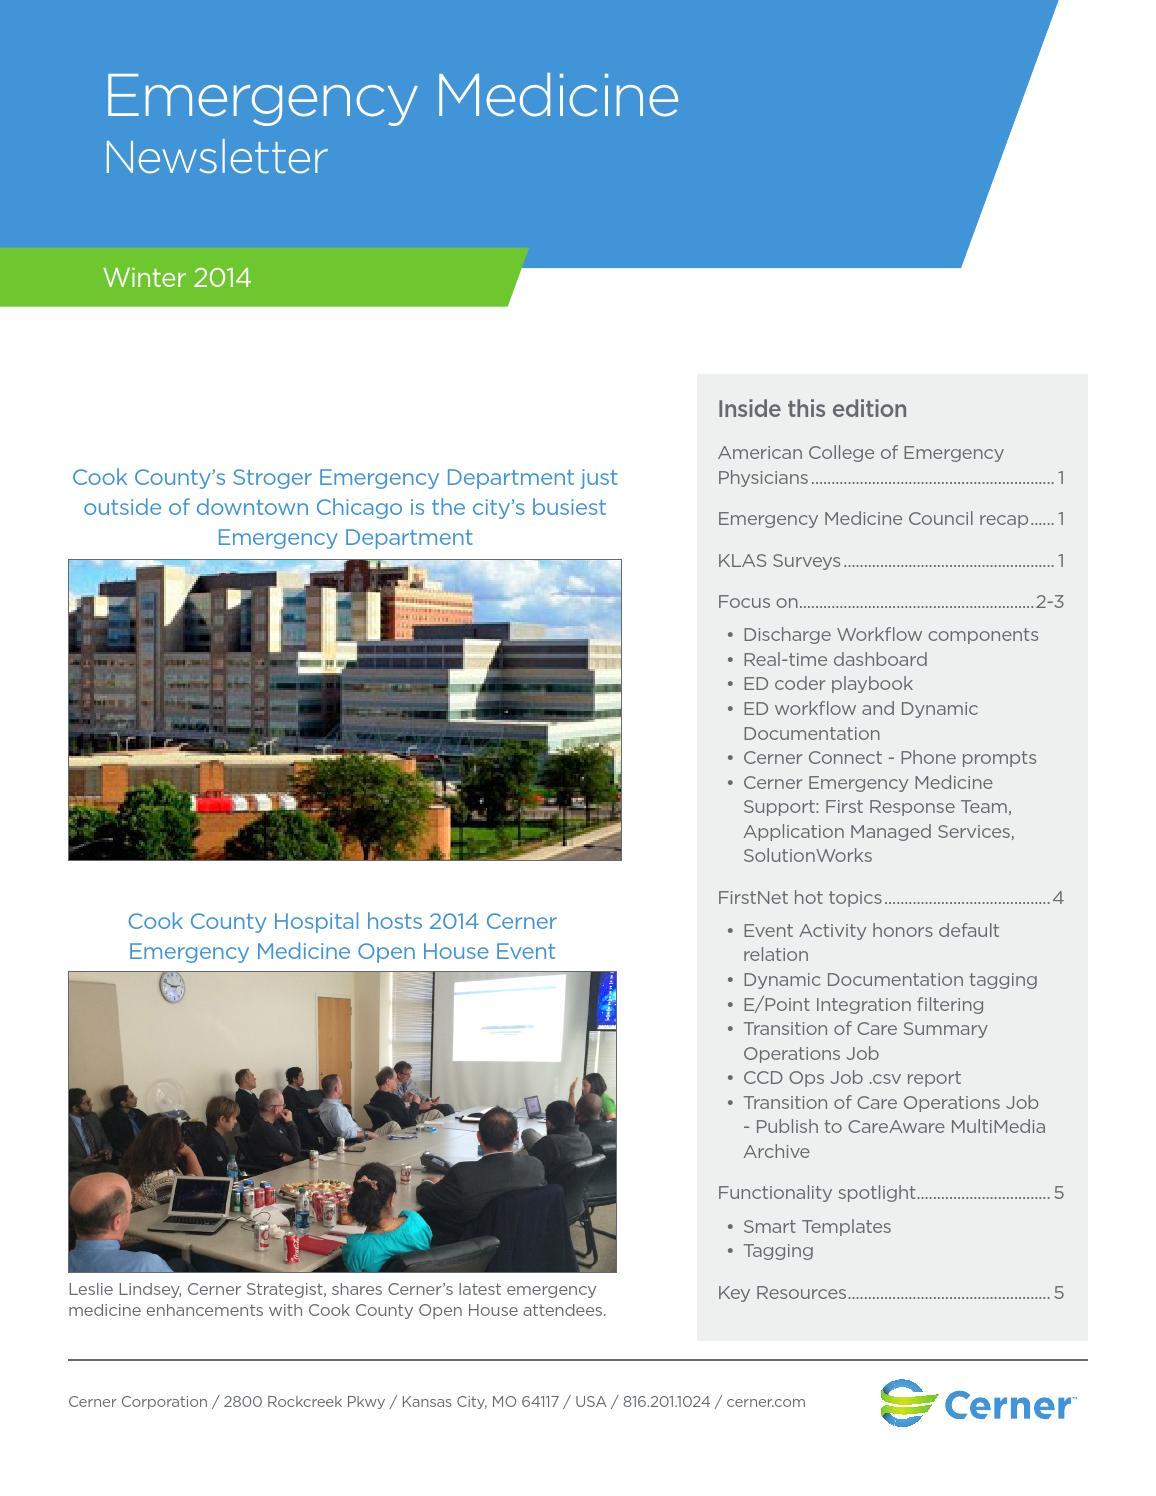 Winter 2015 newsletter by Cerner Emergency Medicine - issuu